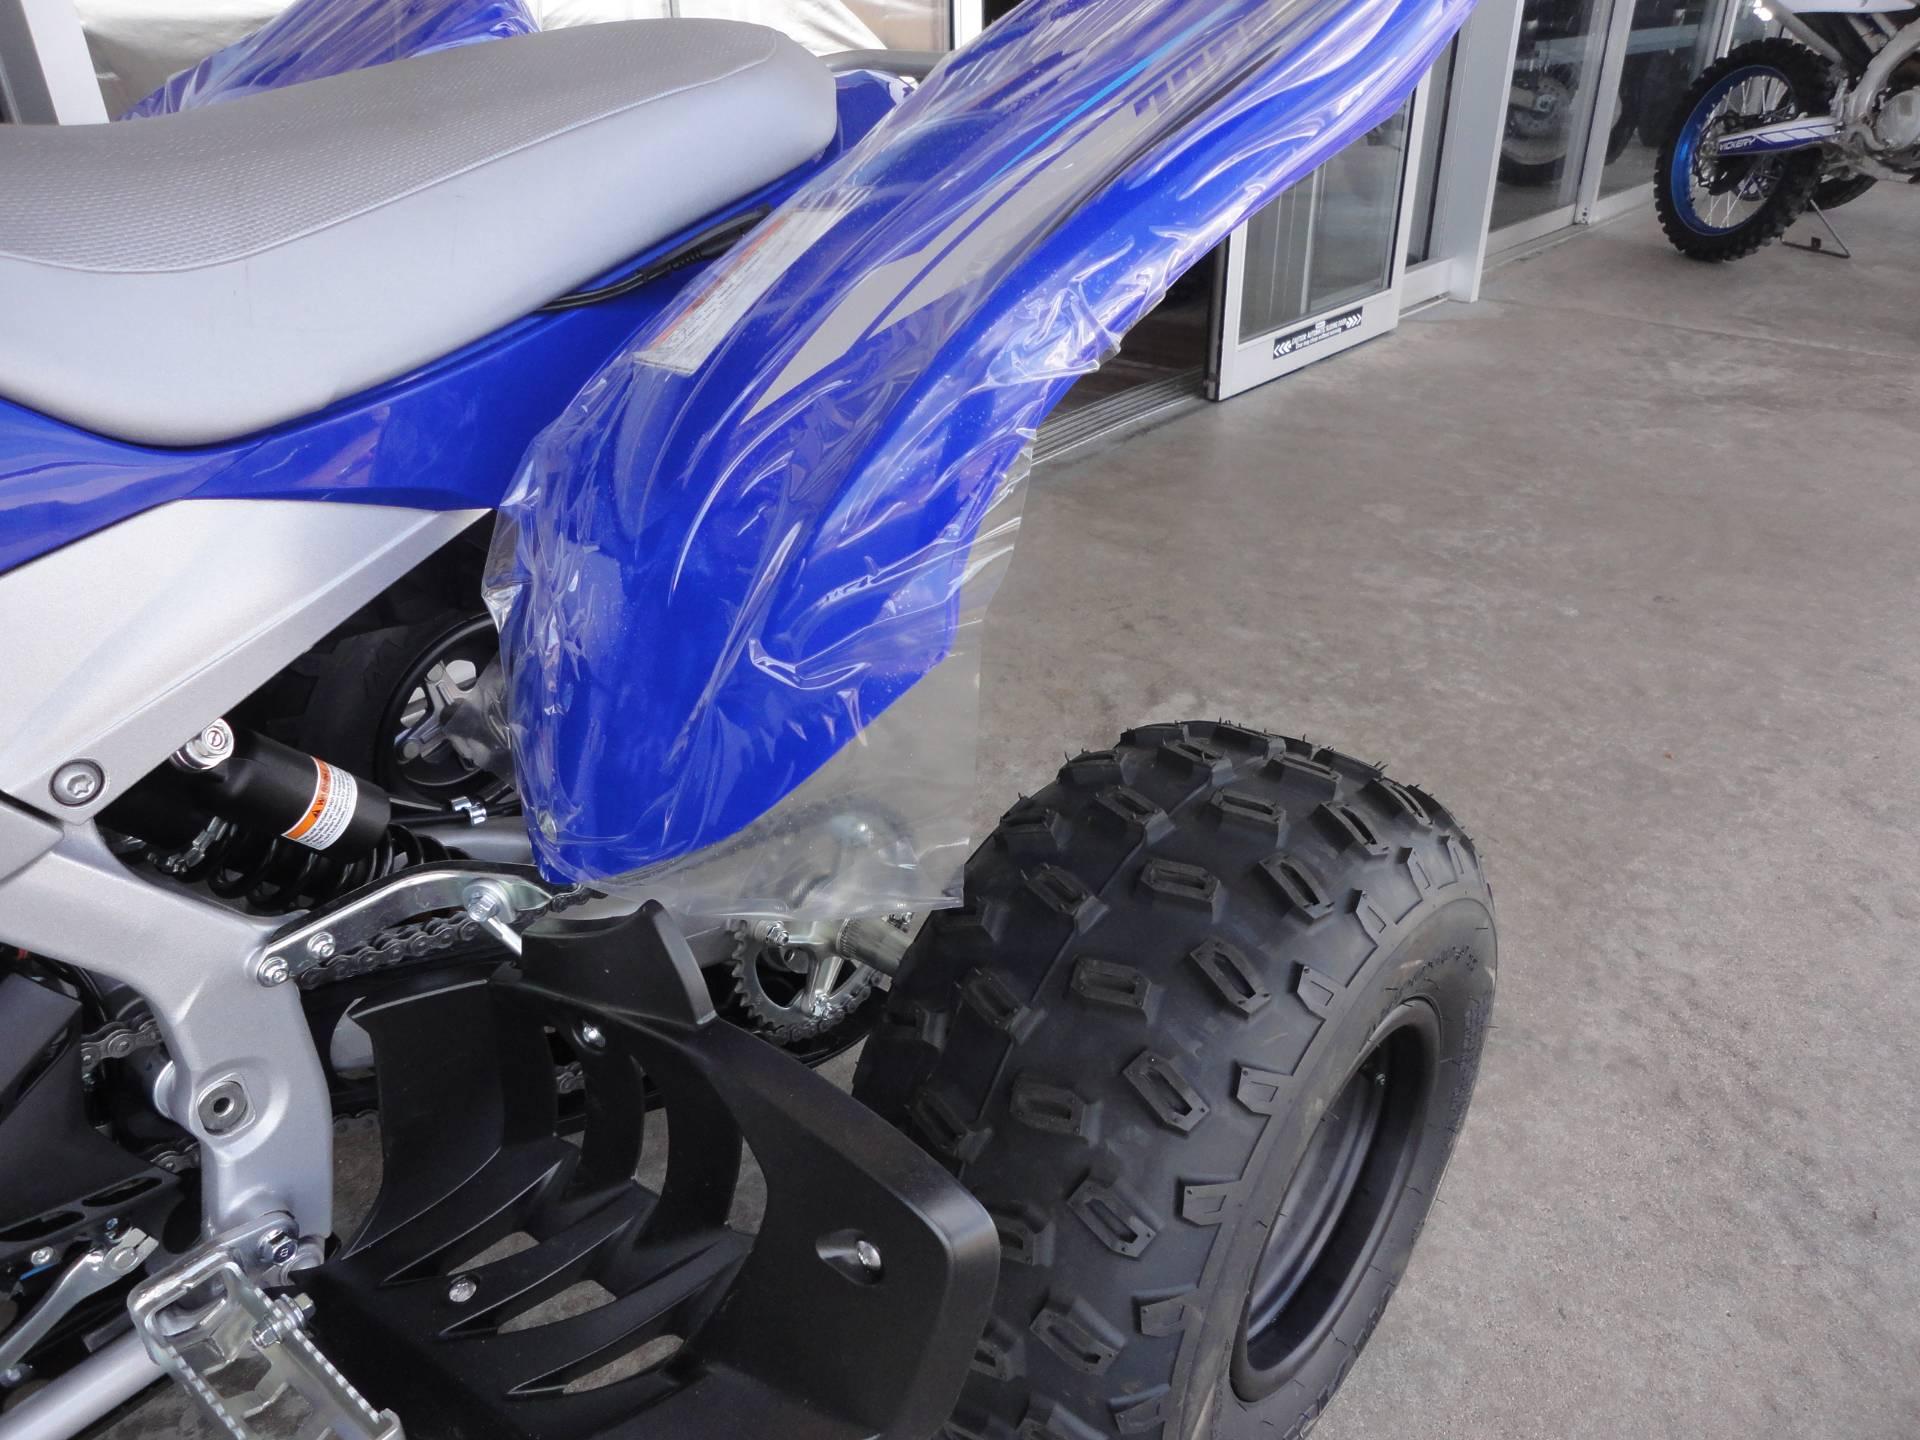 2020 Yamaha Raptor 700R 9